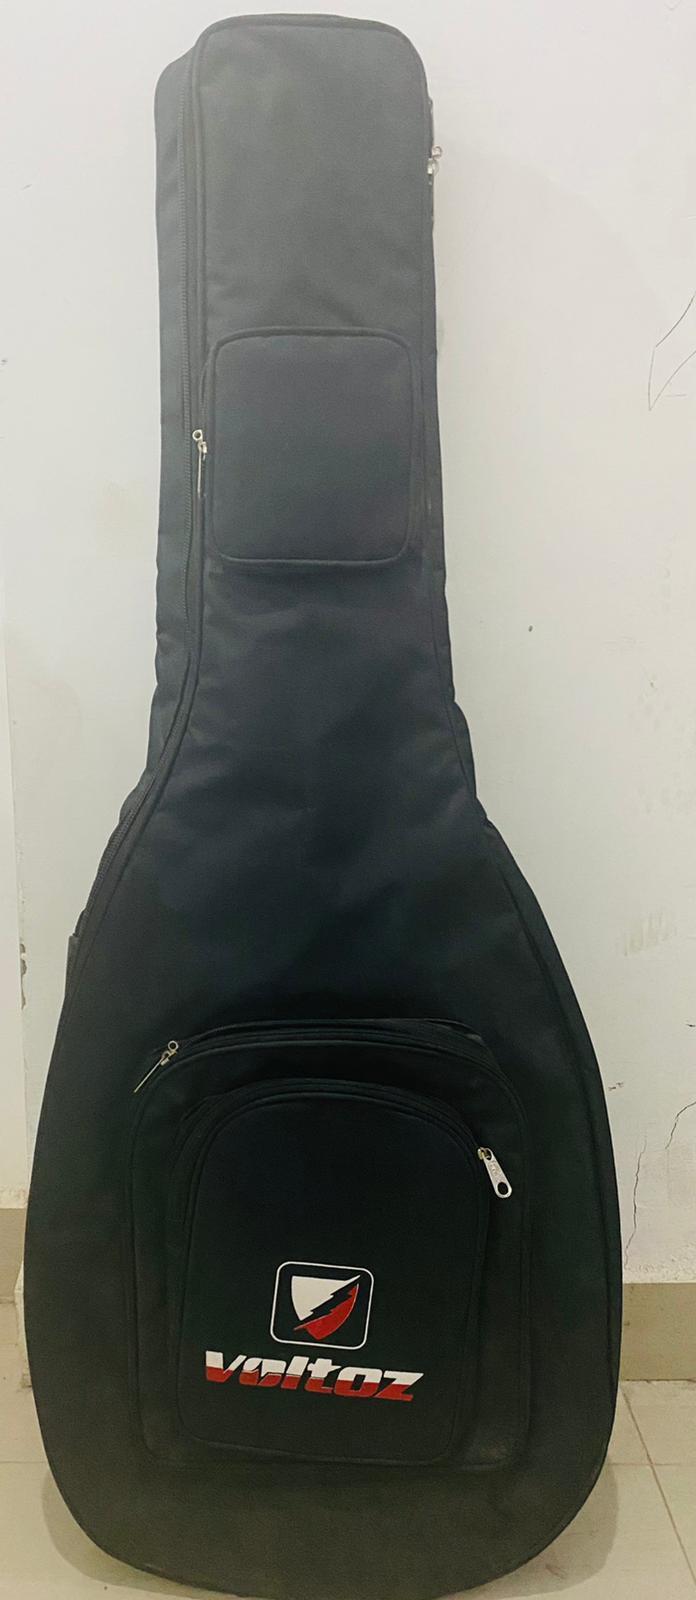 Photron Acoustic Guitar, 38 Inch 20 KD